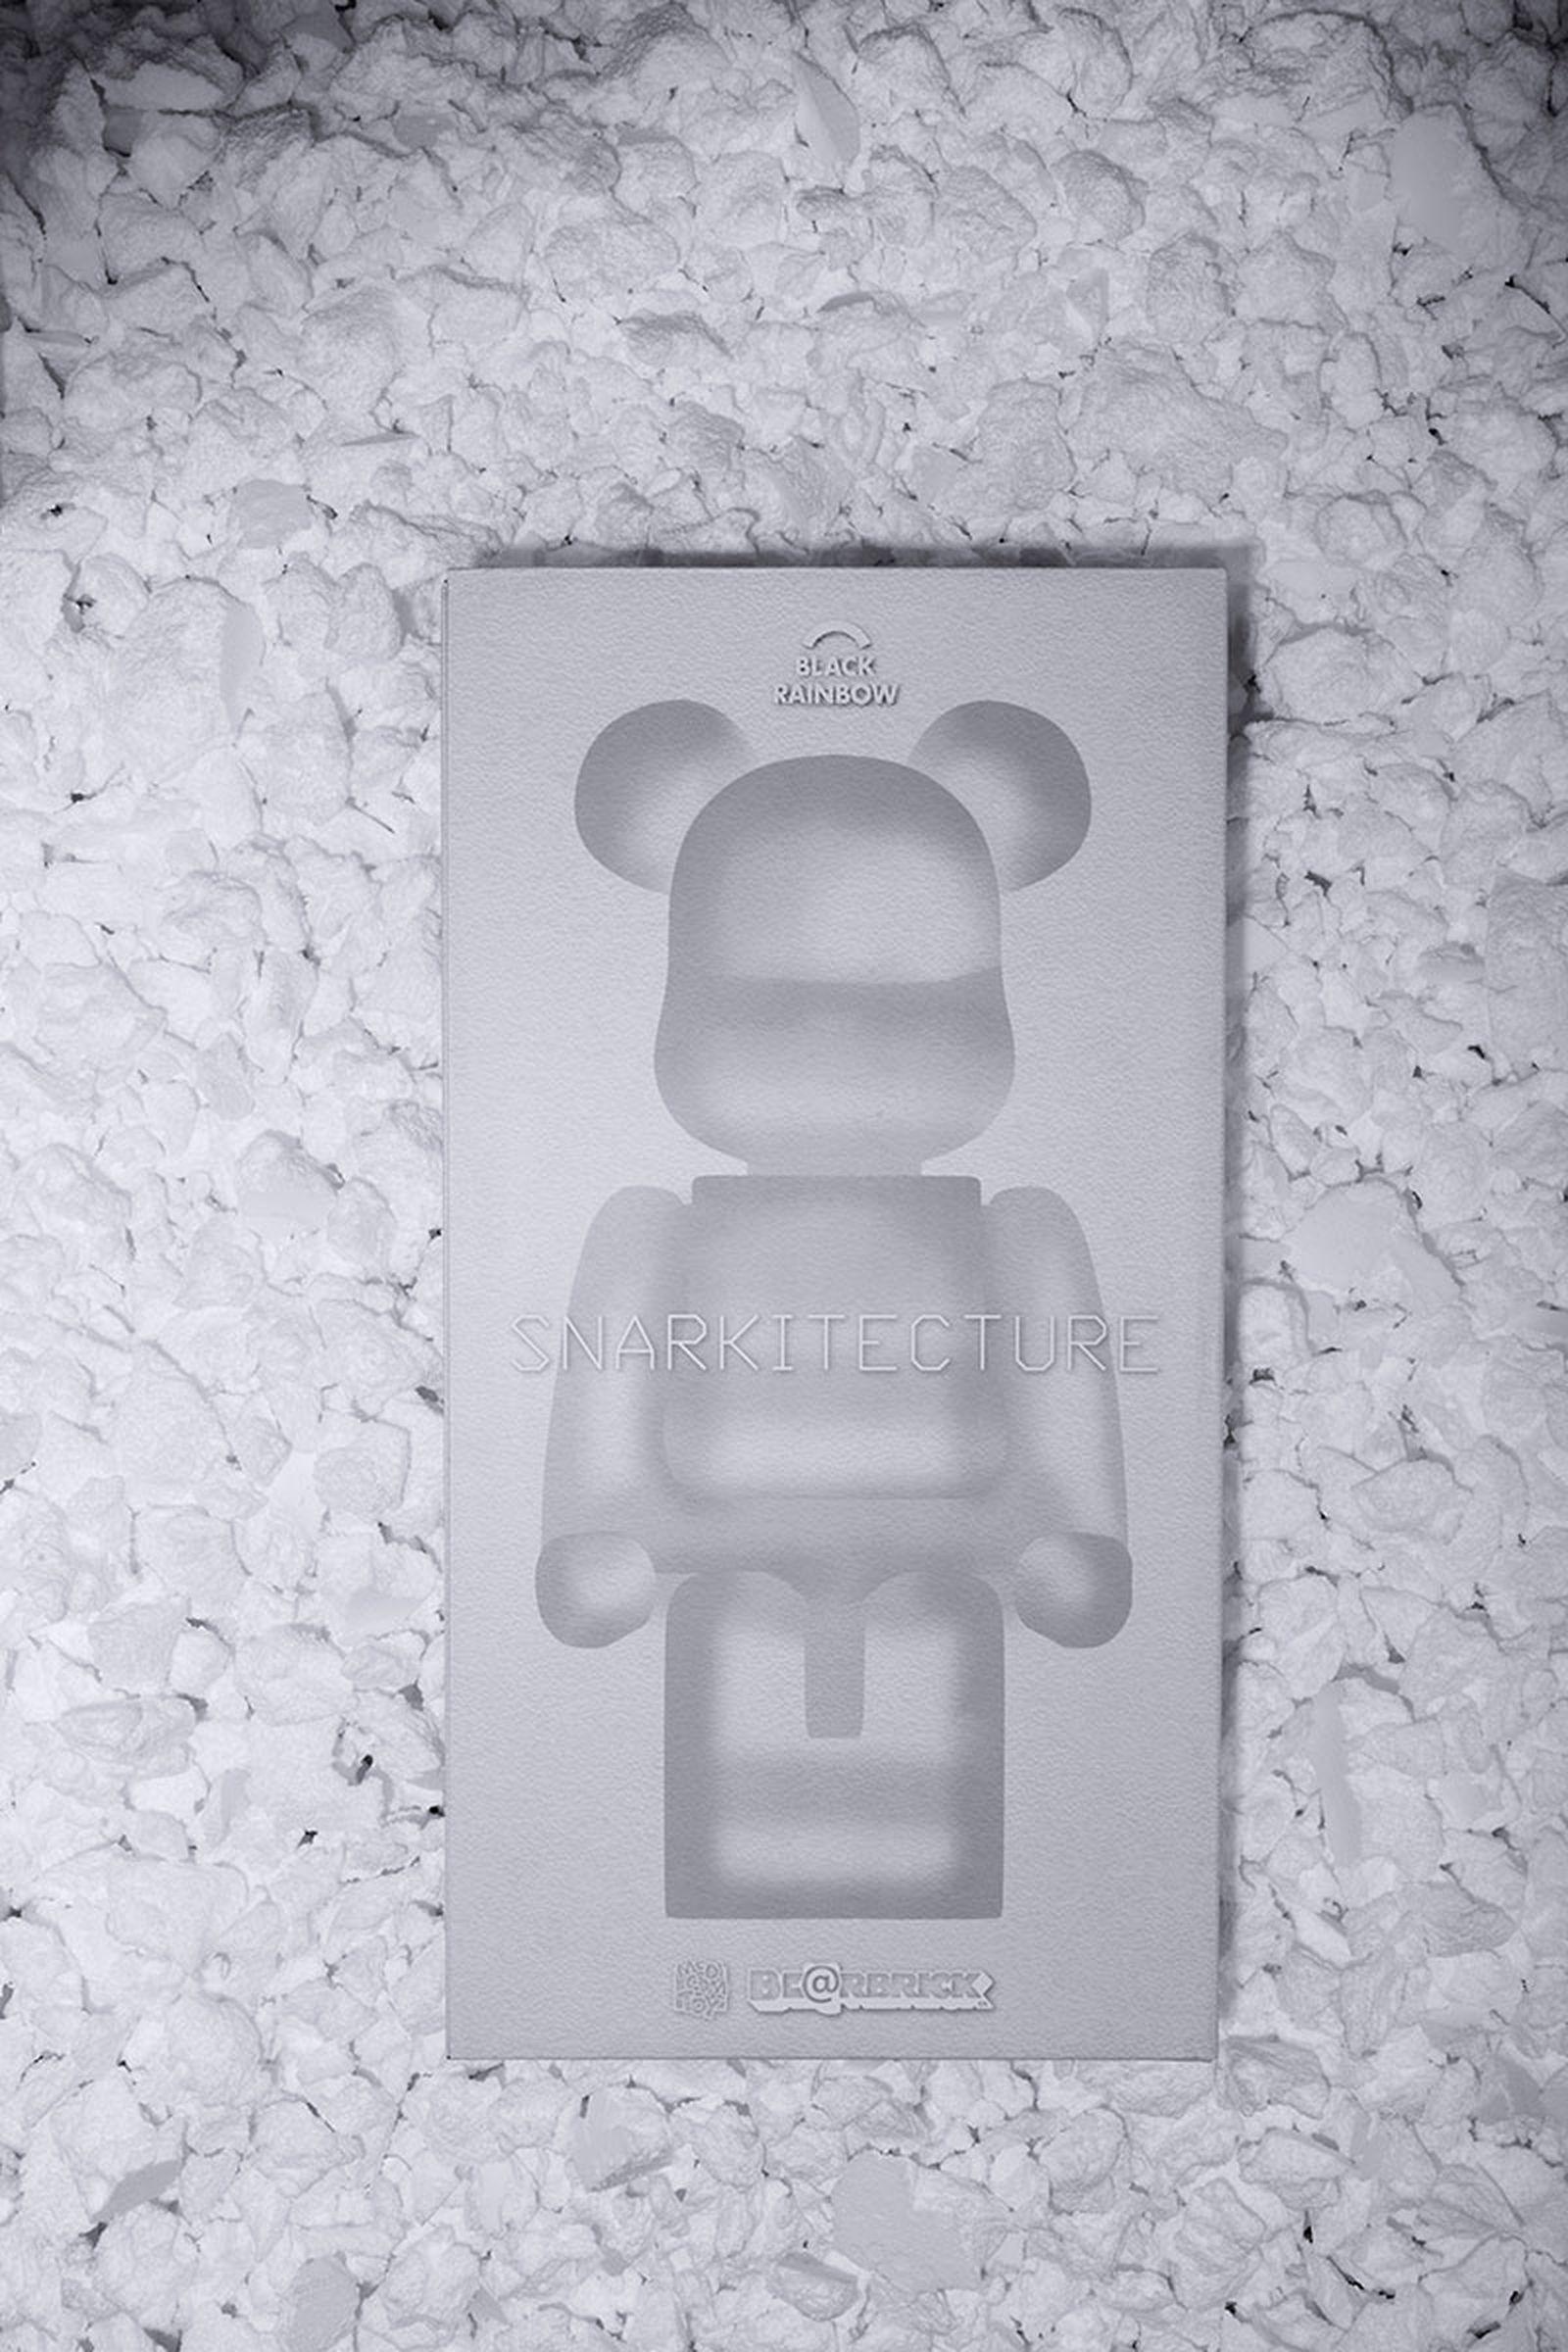 bearbrick snarkitecture blackrainbow 1000% bearbricks medicom toy